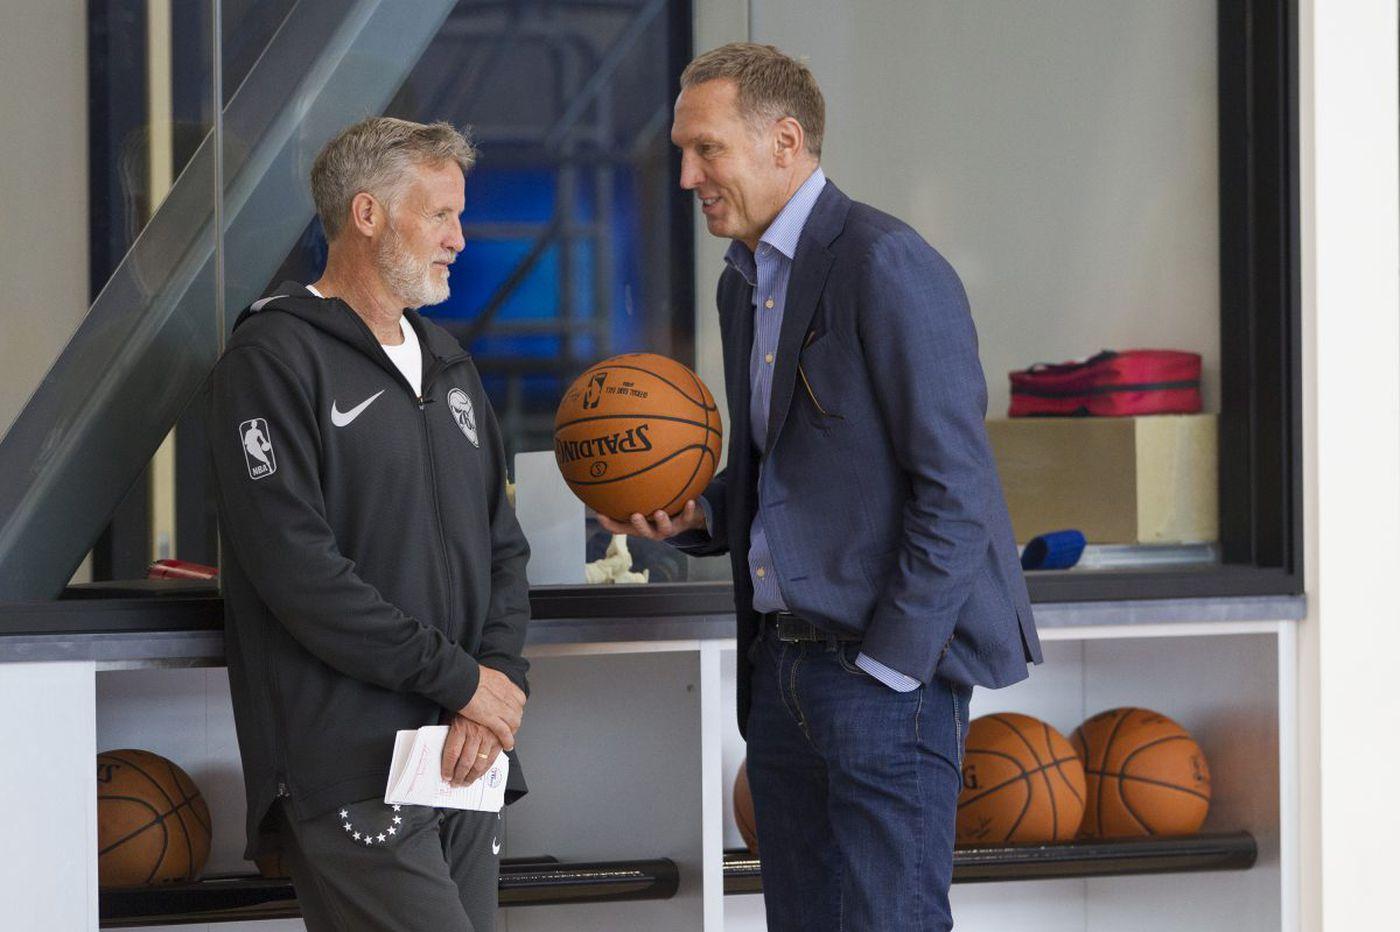 2018 NBA trade deadline news, trades, rumors - live updates